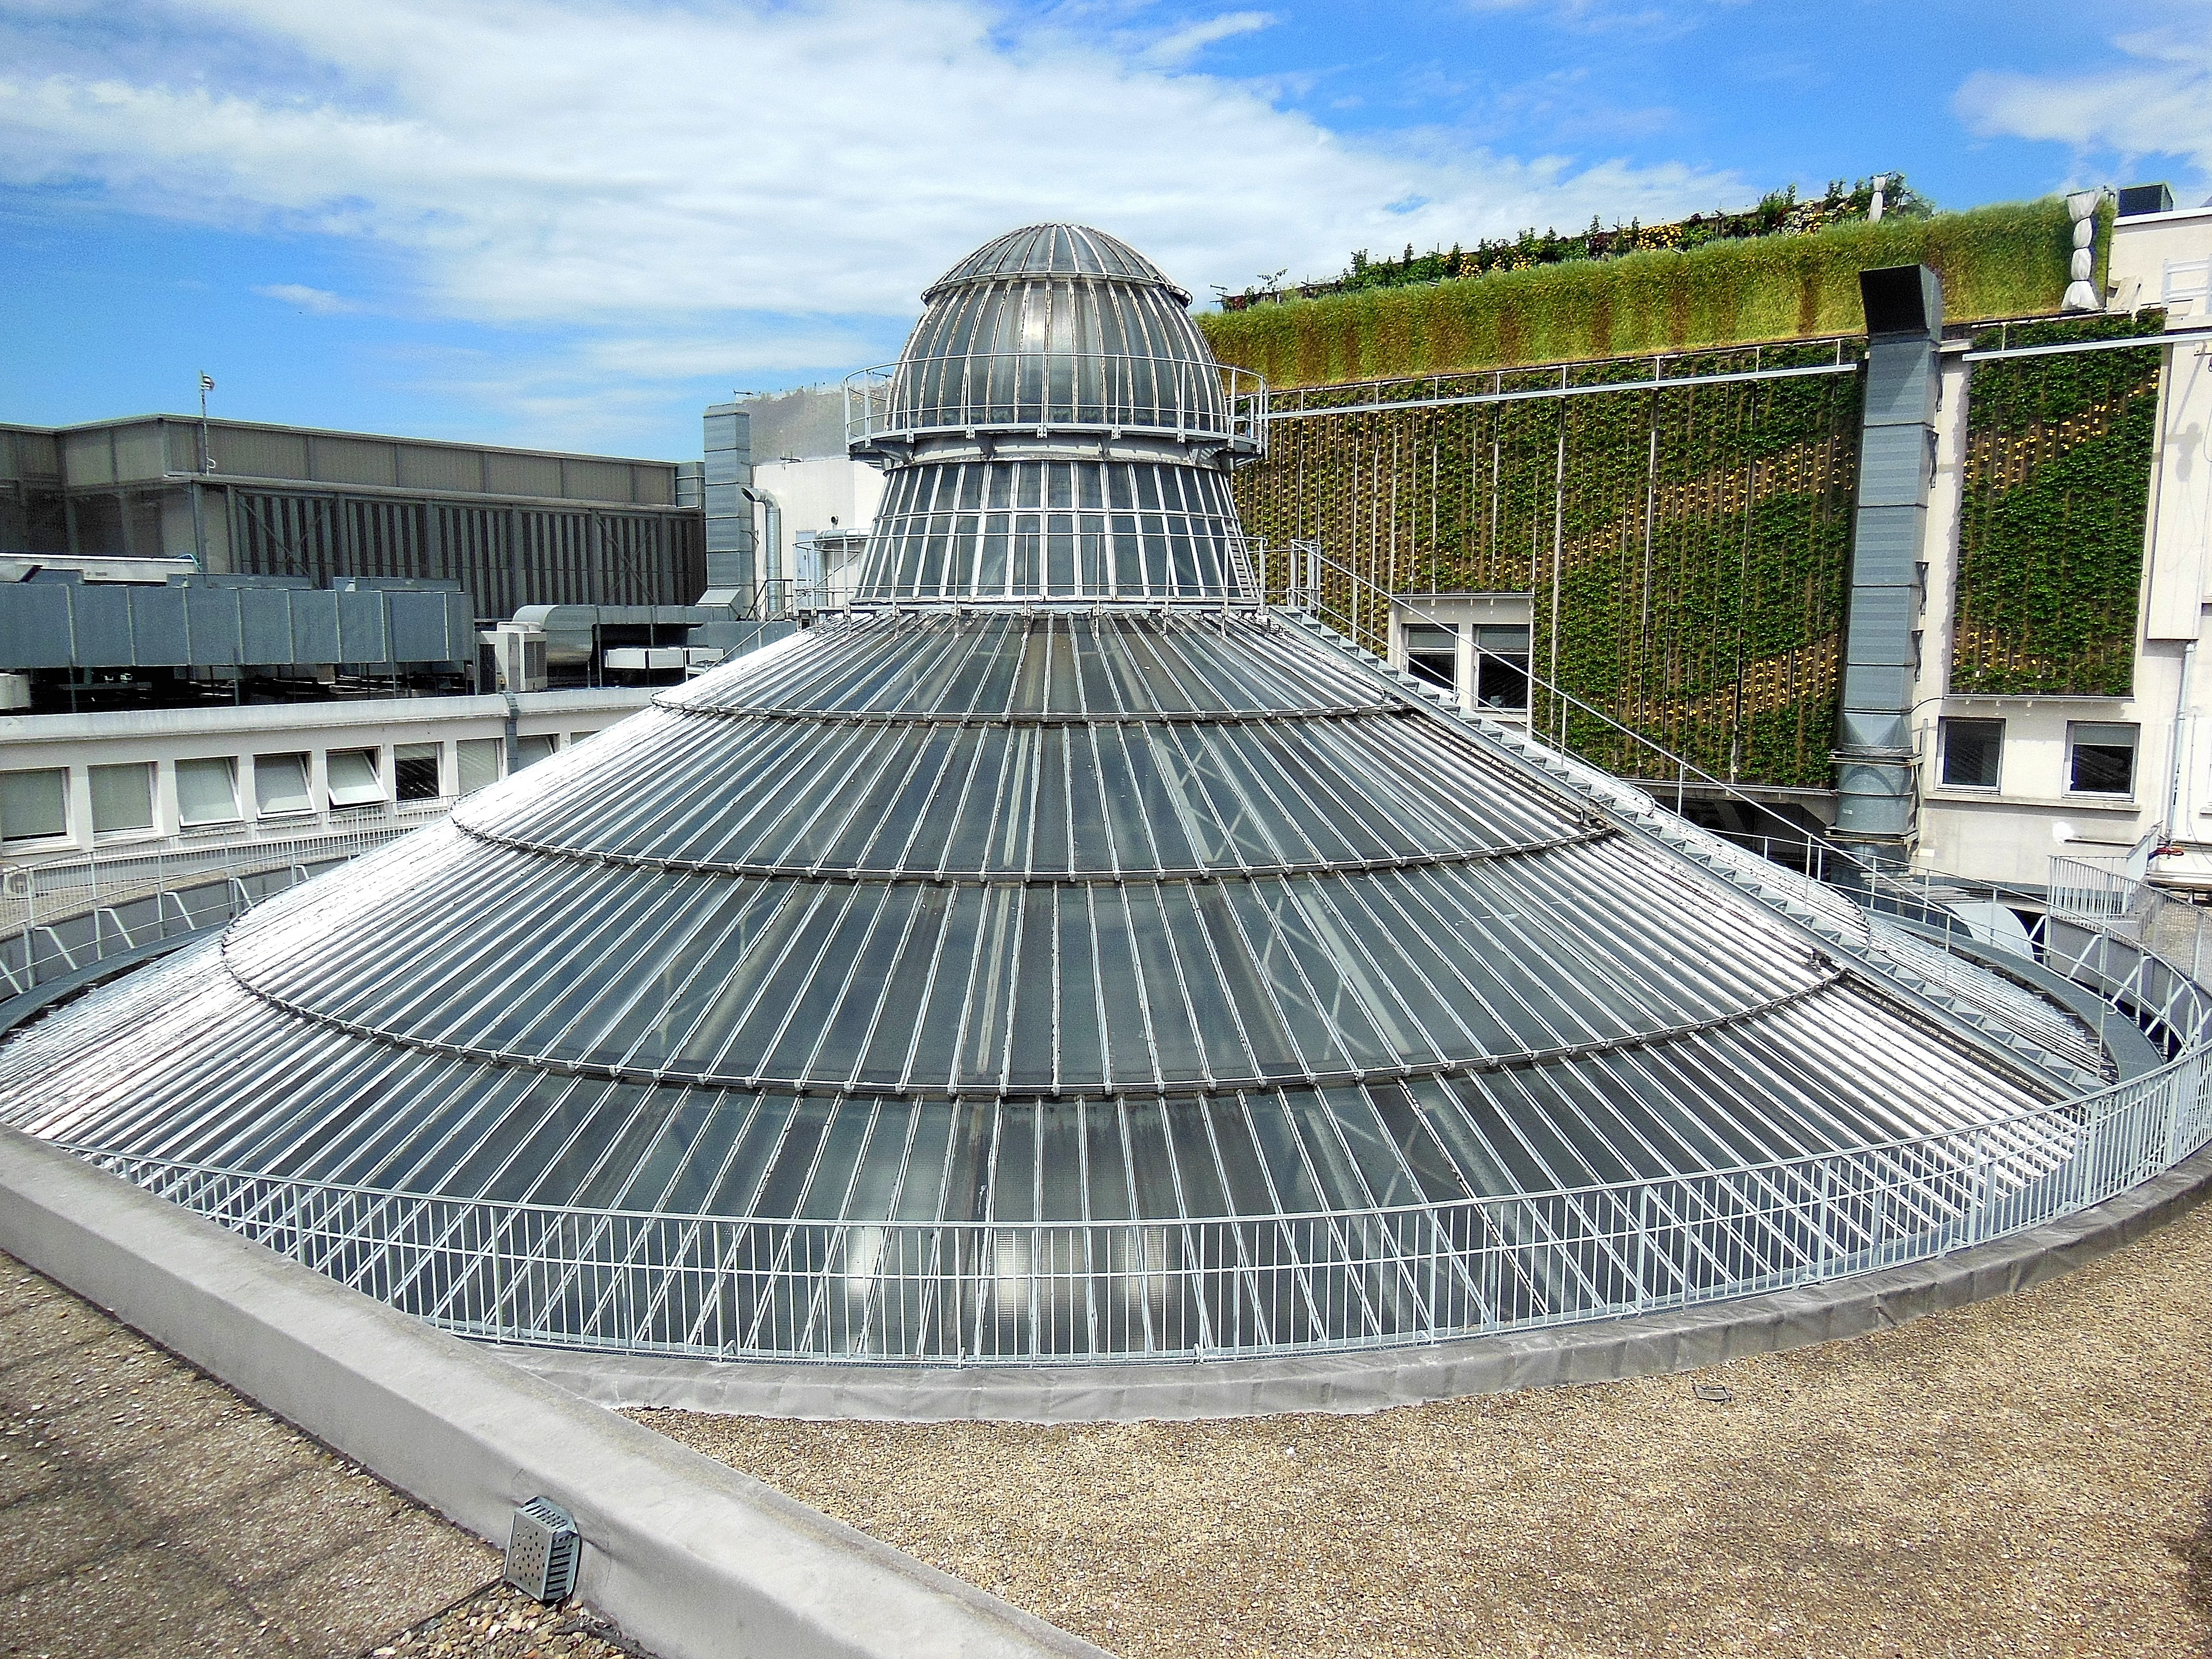 La cúpula por afuera.